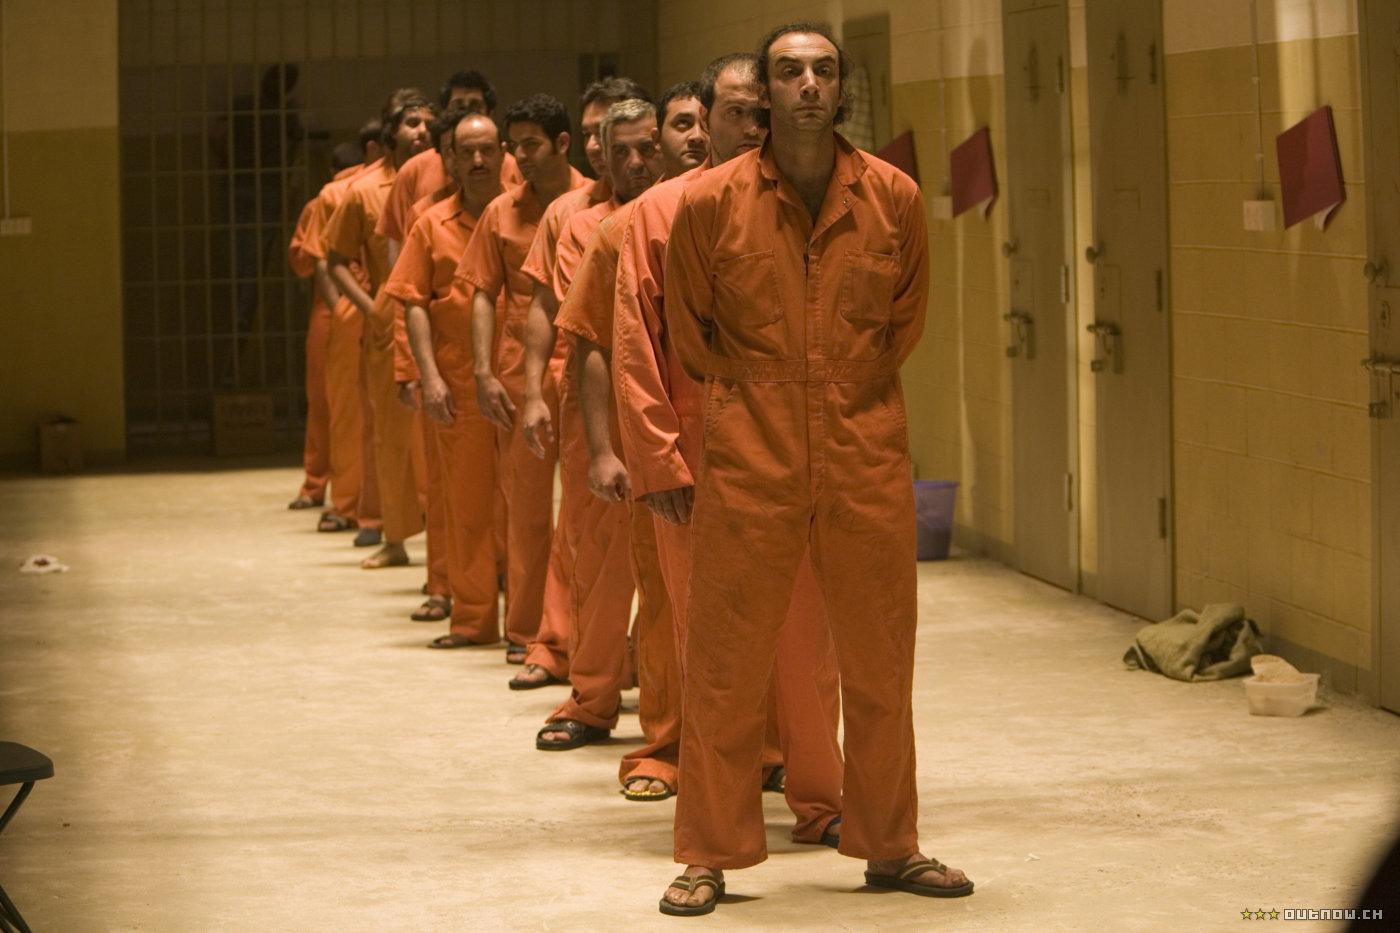 Detainees at Abu Gharib.